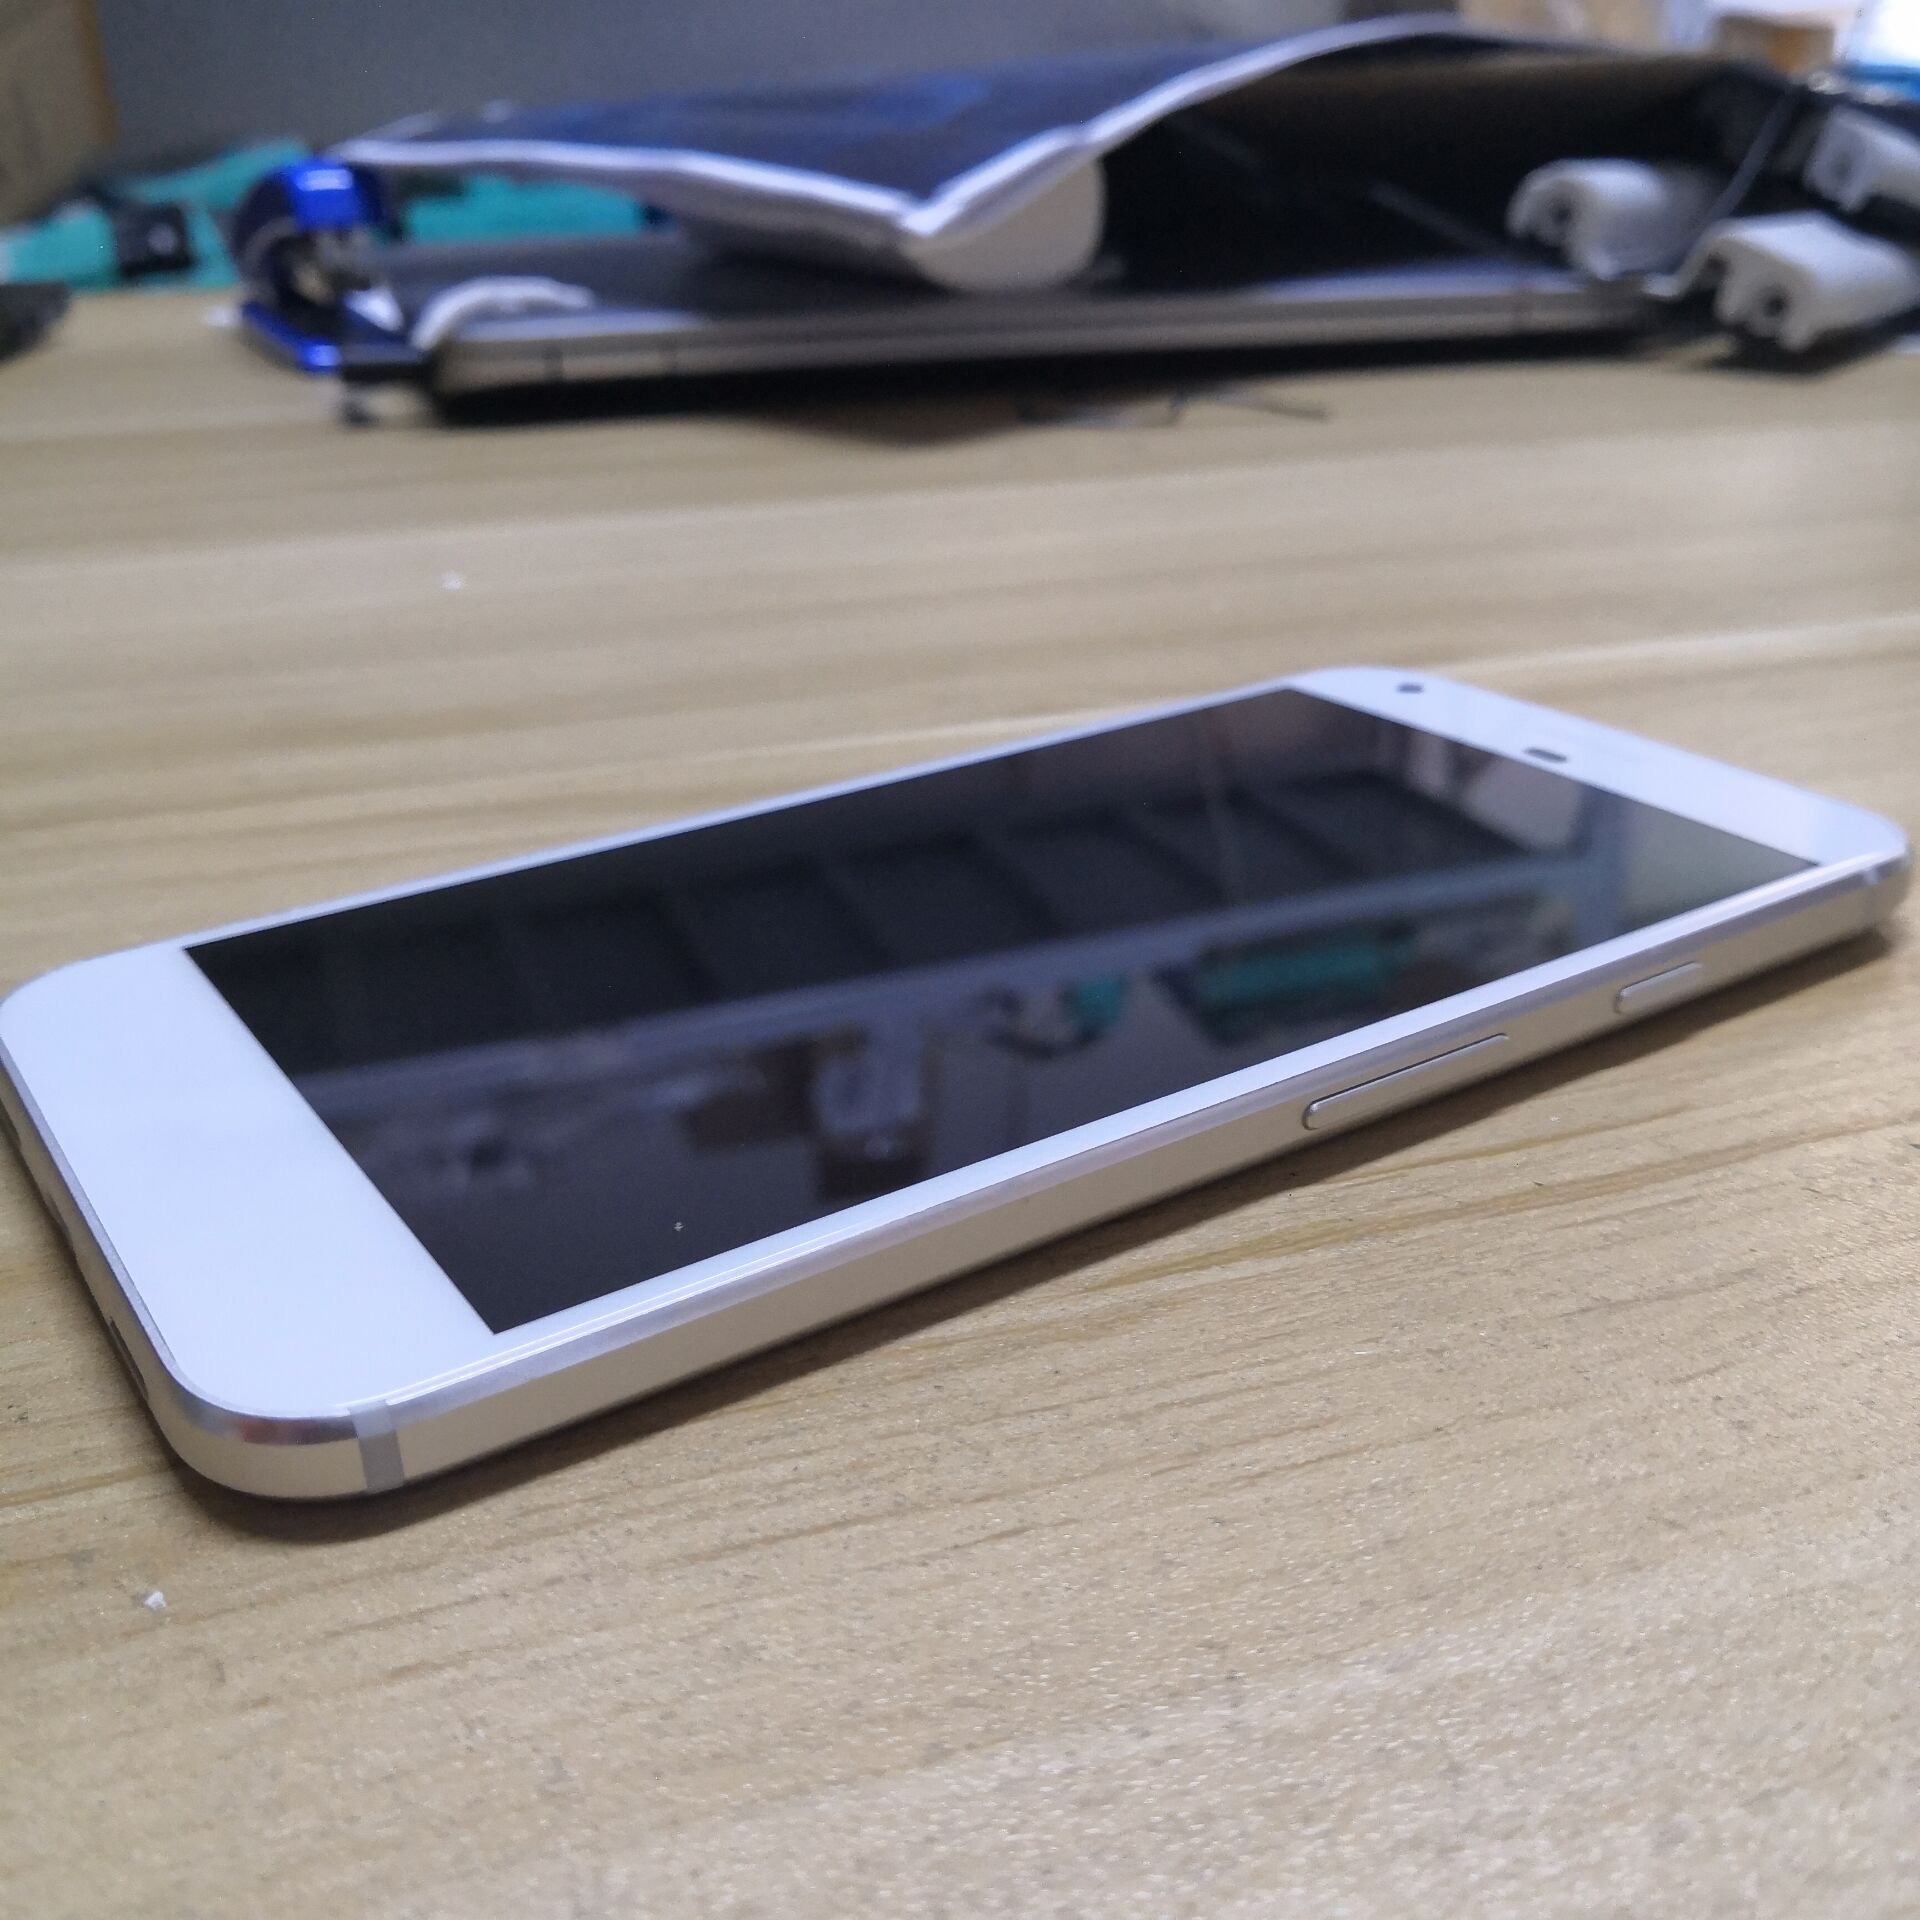 Google Pixel XL smartphone 5.5' inch 1440 x 2560 pixels screen 4GB RAM 128GB ROM Mobile Phone enlarge